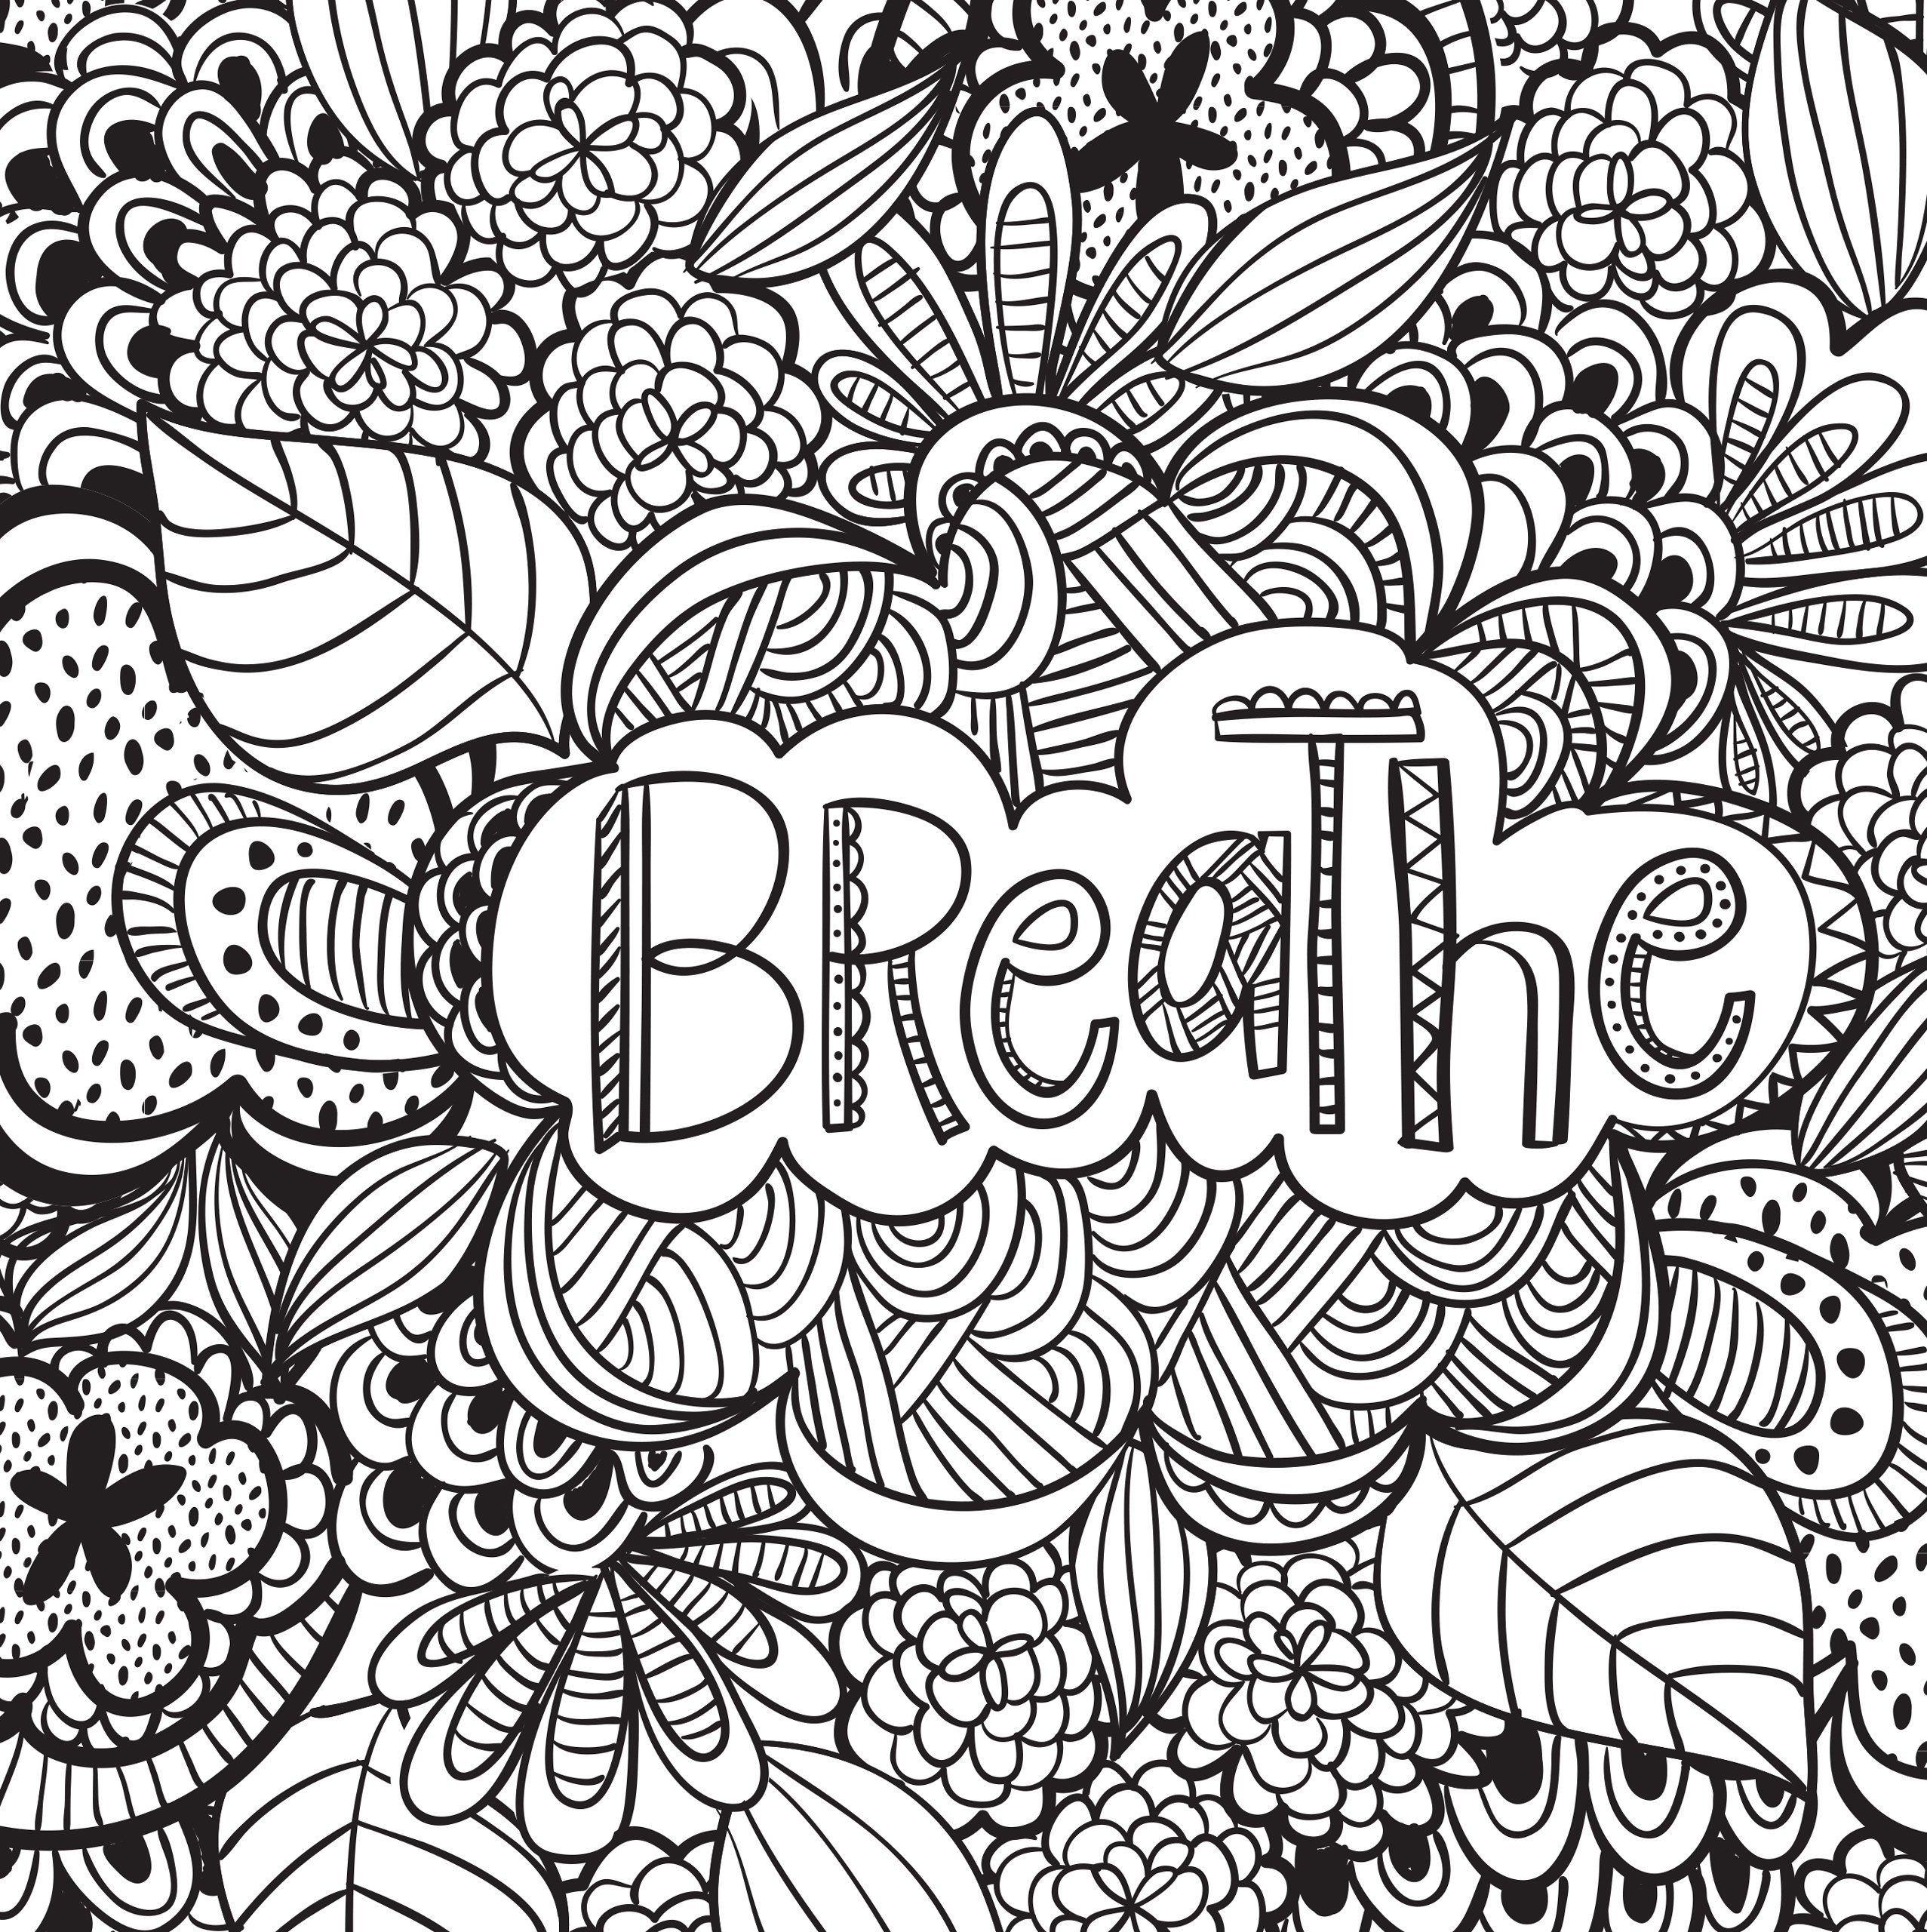 Adult Stress Coloring Books  Joyful Inspiration Adult Coloring Book 31 stress